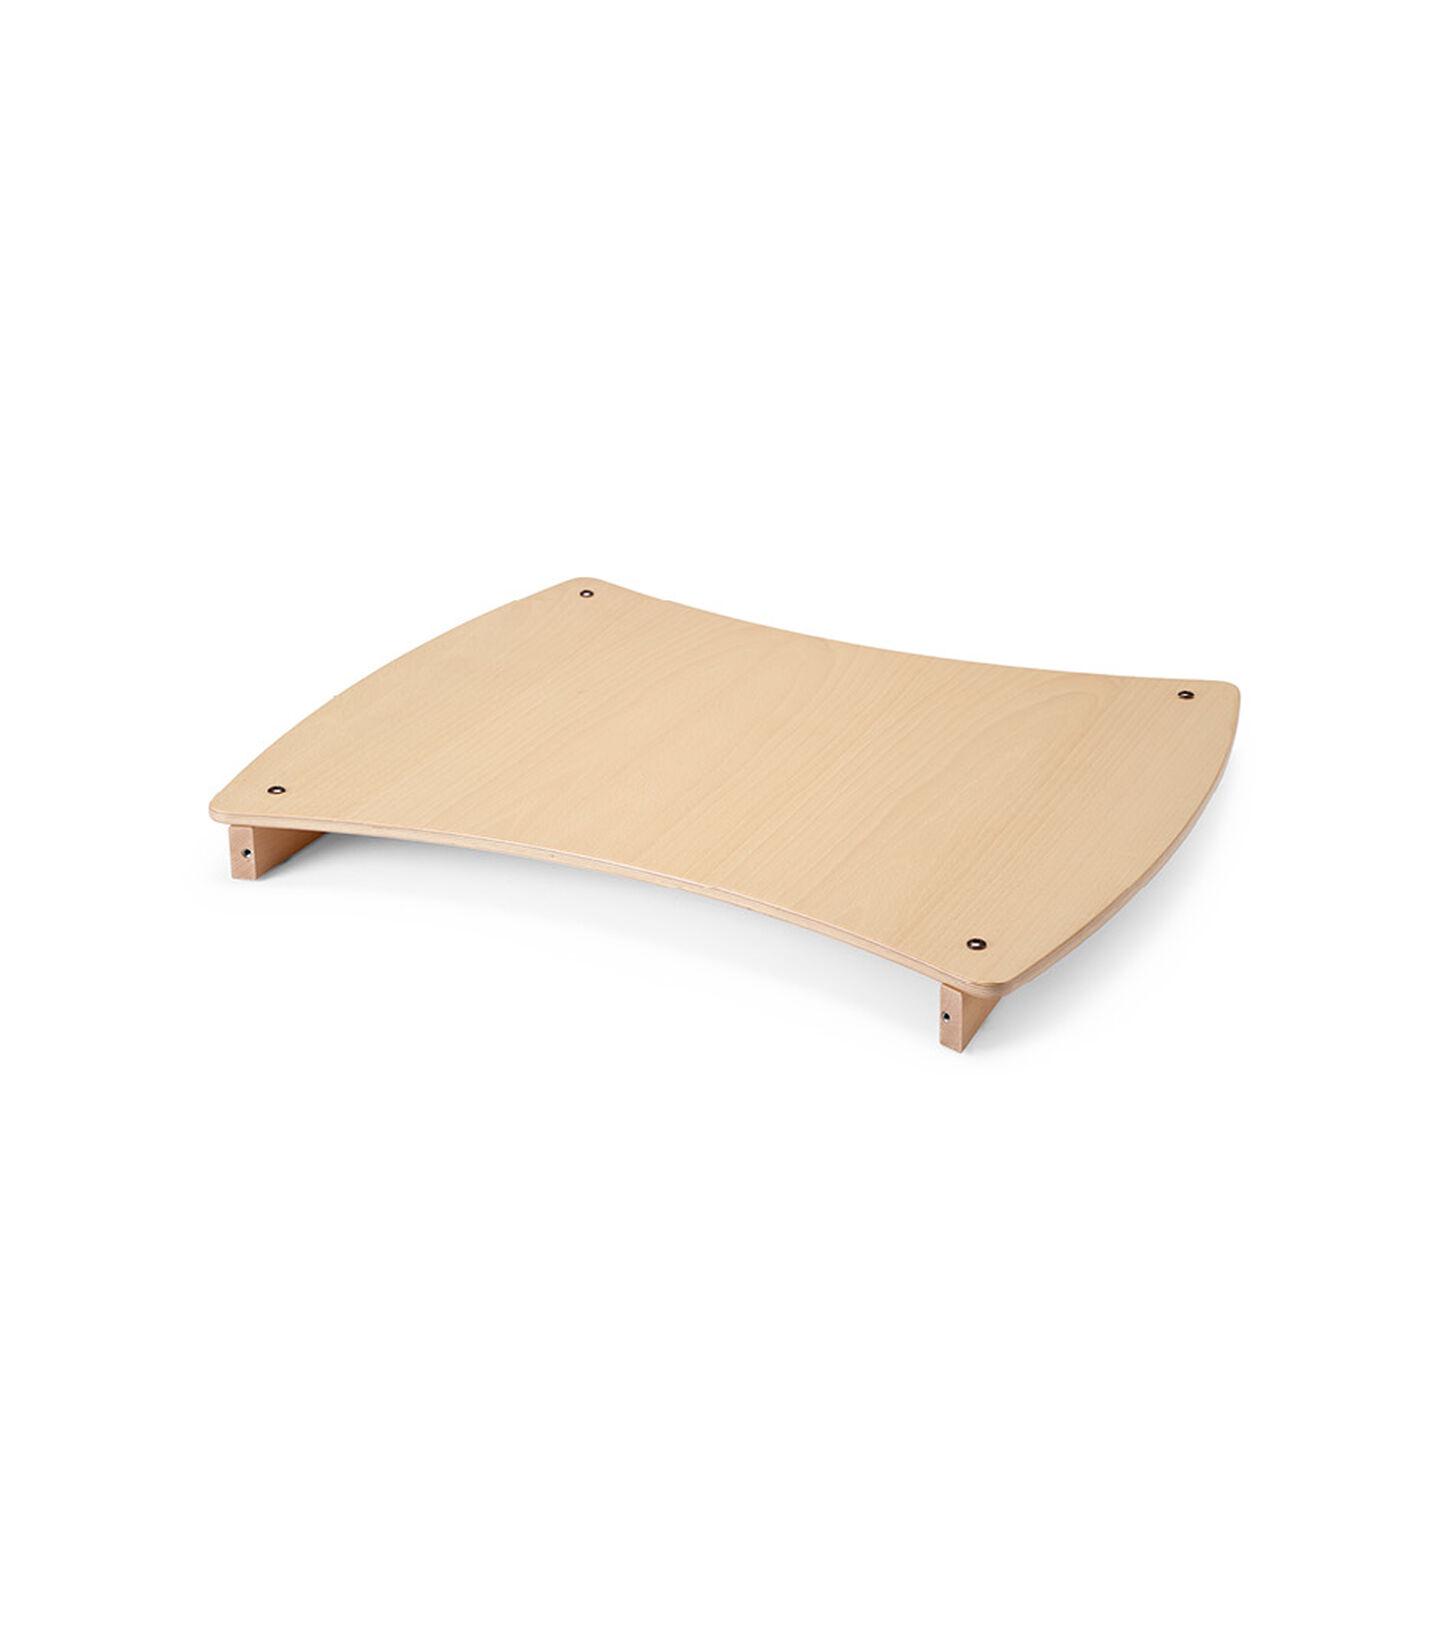 Stokke® Care™ Topshelf compl Natural, Natural, mainview view 2